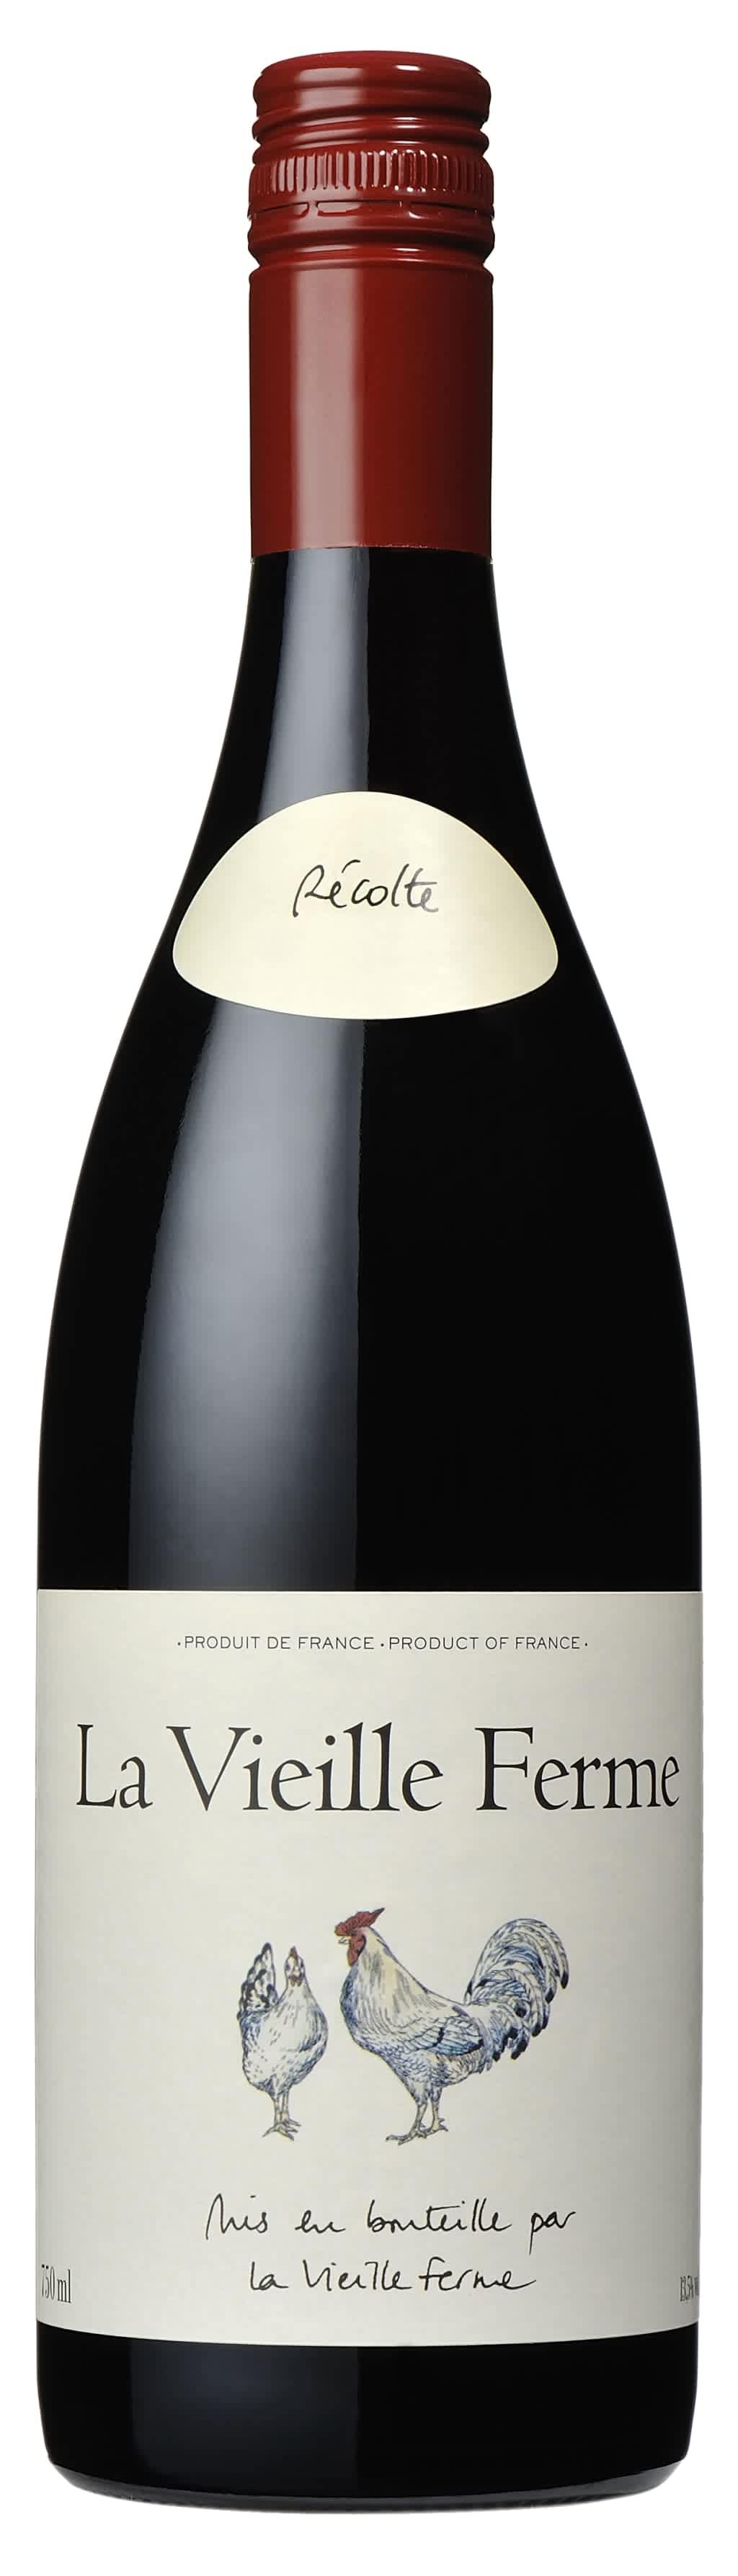 French Wine Sale at Wine.com